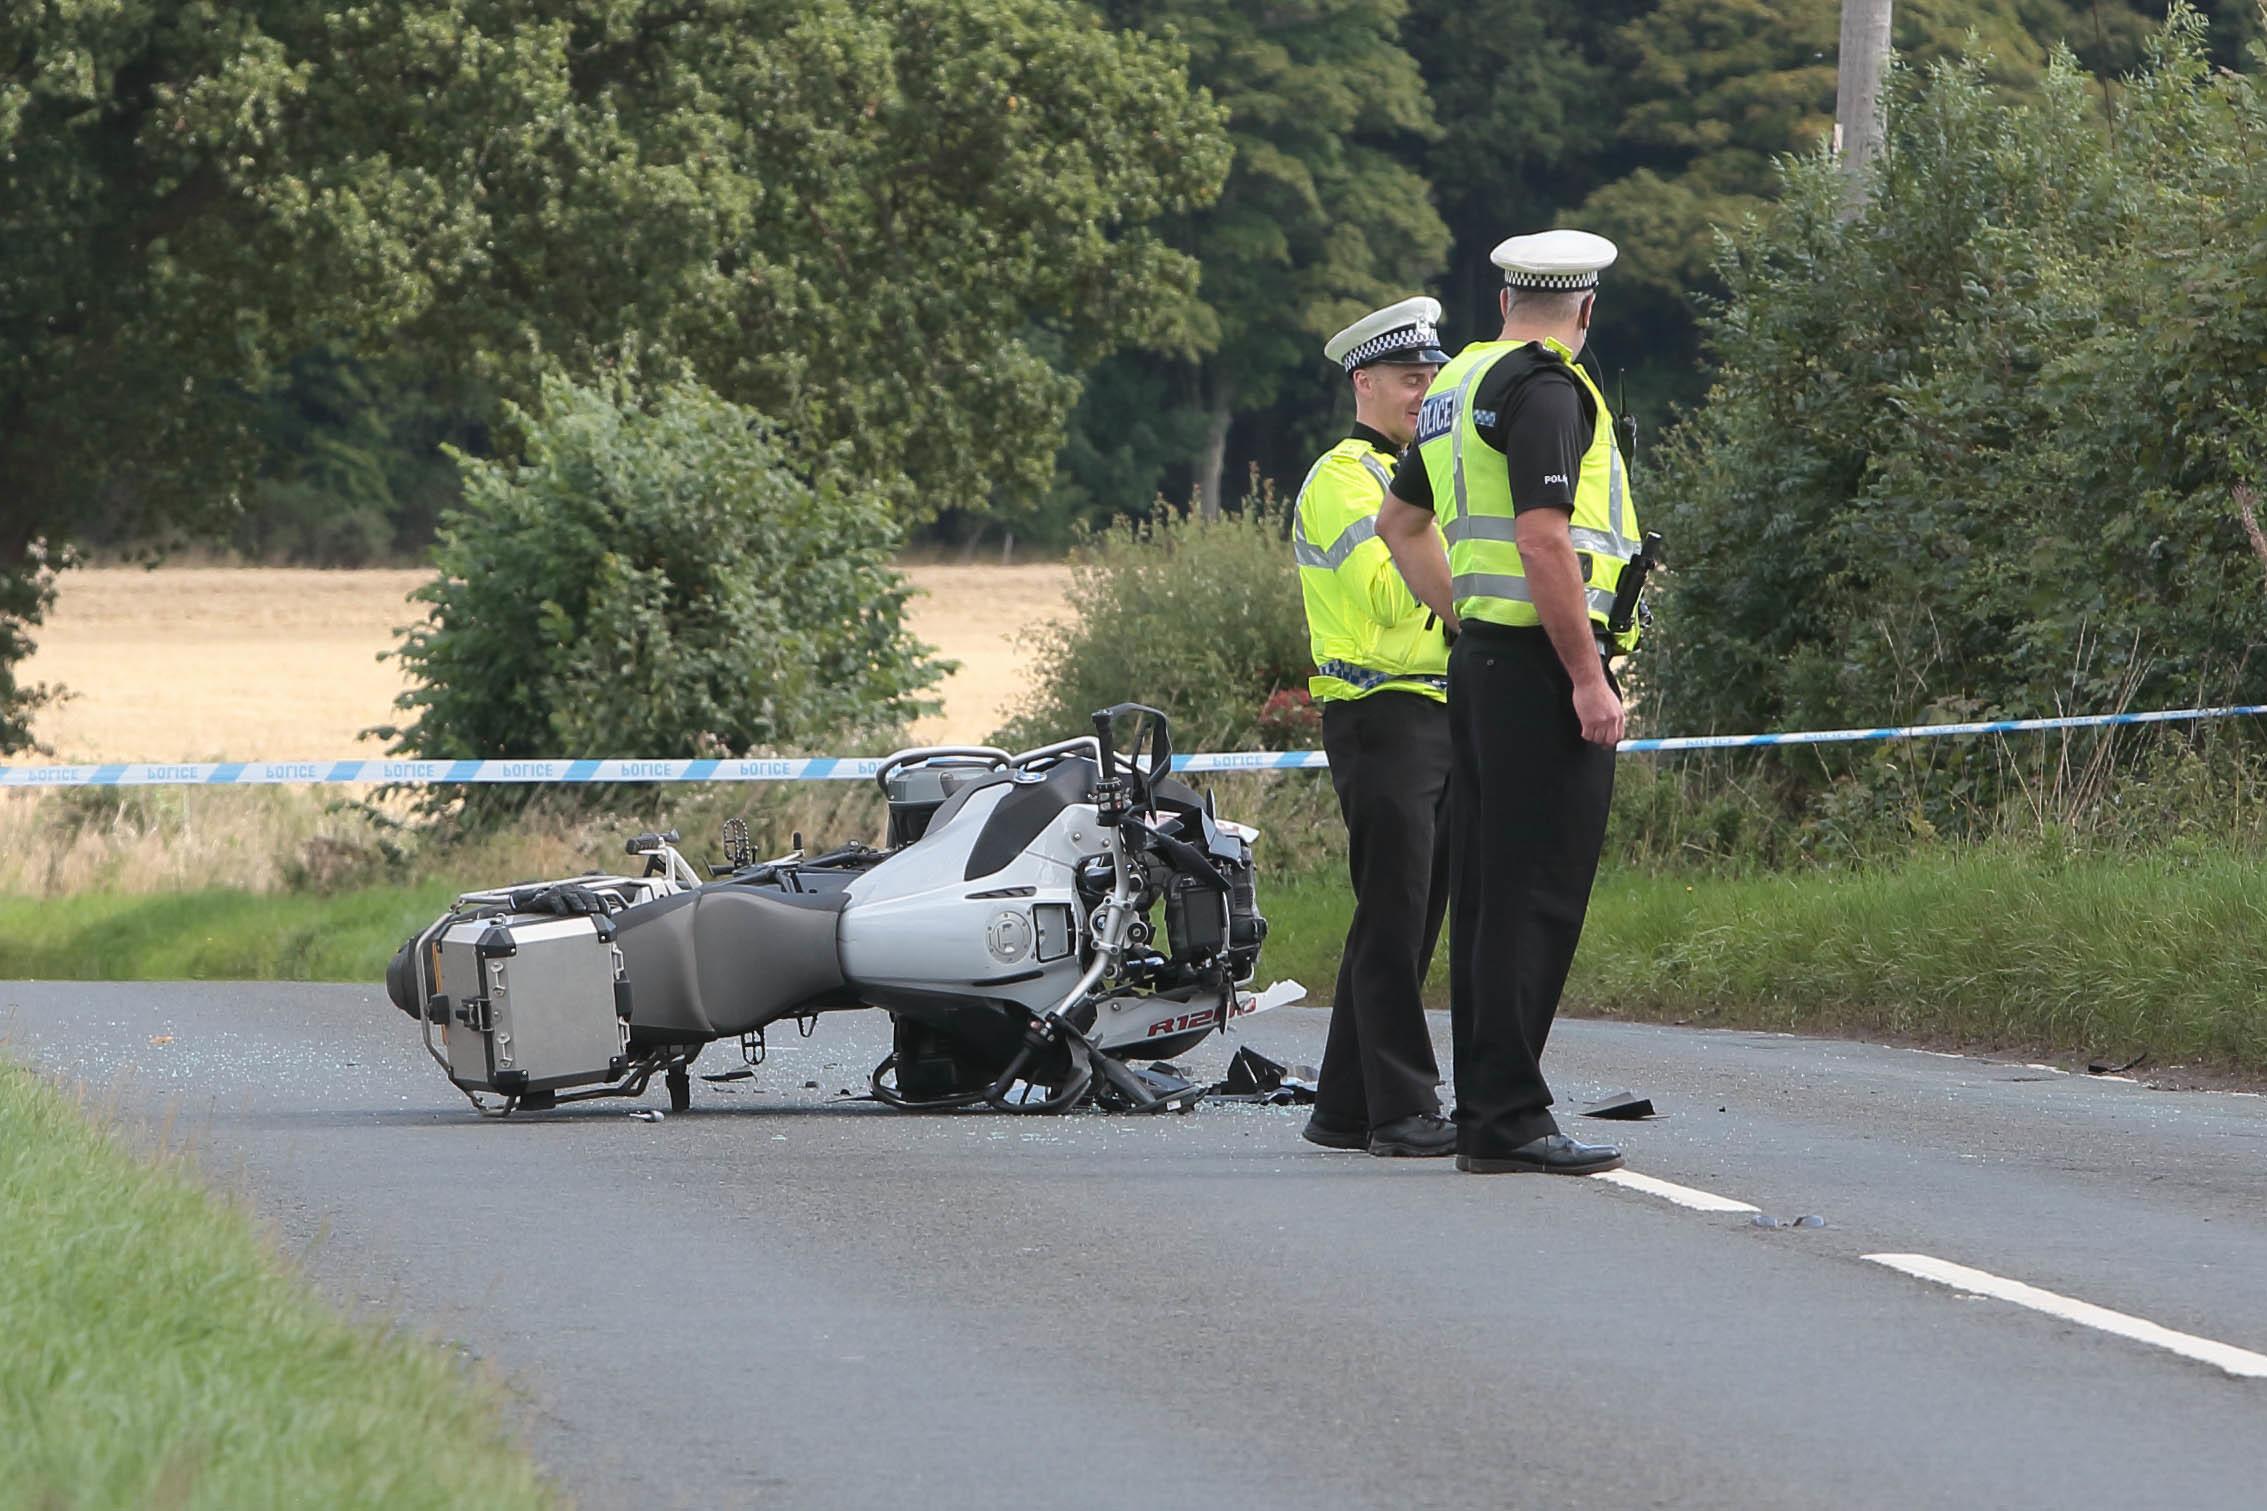 The scene of the crash on the A93 near Perth Racecourse.